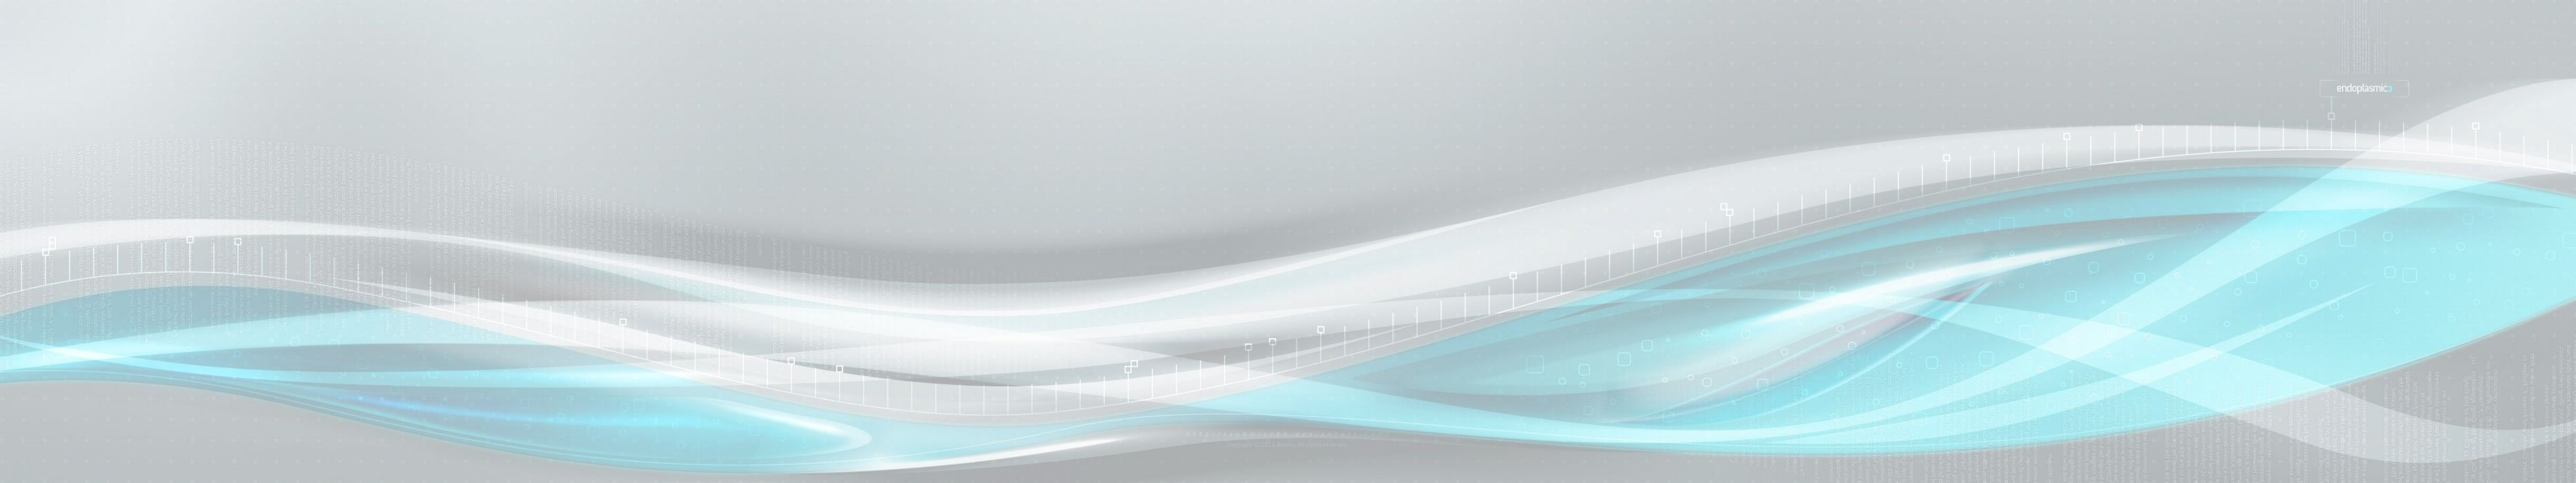 triple monitor screen wallpaper abstract abstrait wallpaper